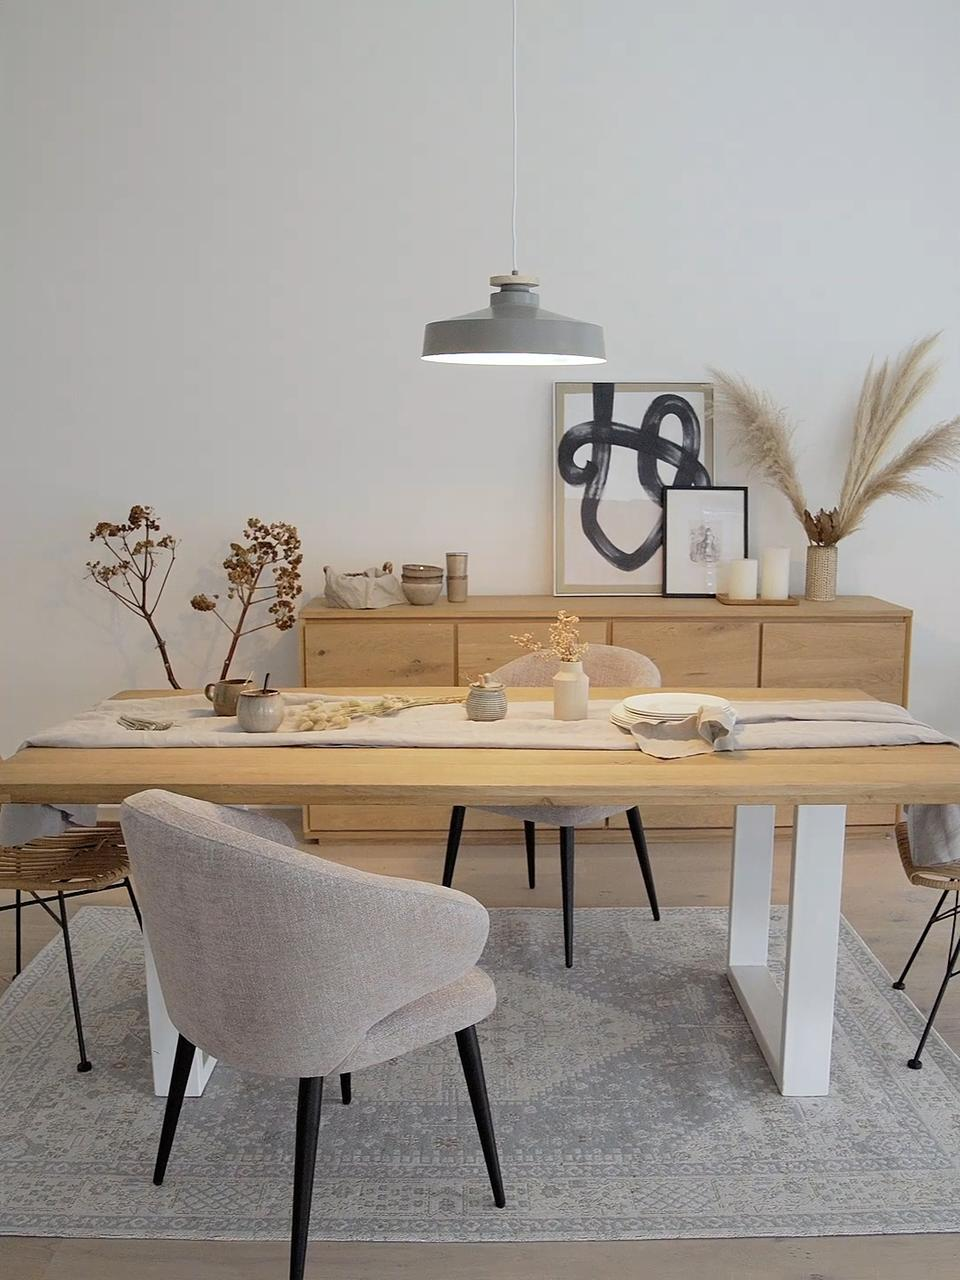 Skandi-Pendelleuchte Malm, Lampenschirm: Metall, Dekor: Holz, Baldachin: Metall, Grau, Ø 40 x H 20 cm